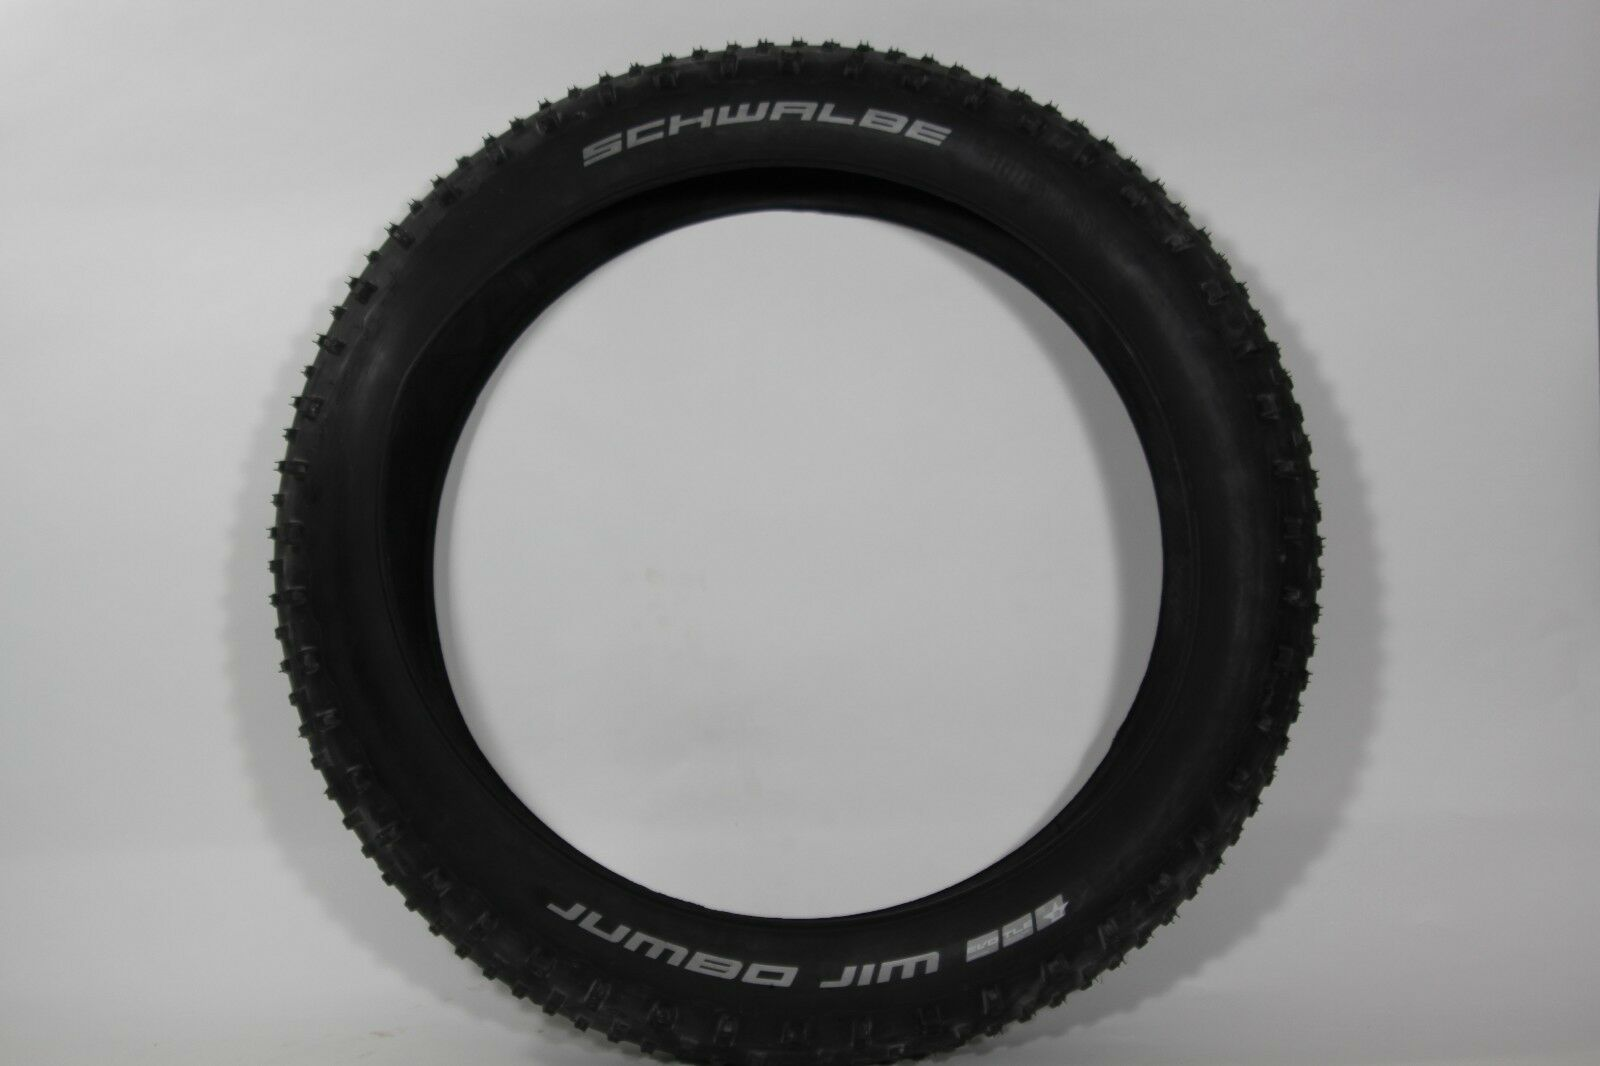 Schwalbe Jumbo  Jim Folding Fat Tire 26 x 4.80  EVO, TLE, Pace 3 Star  high quaity